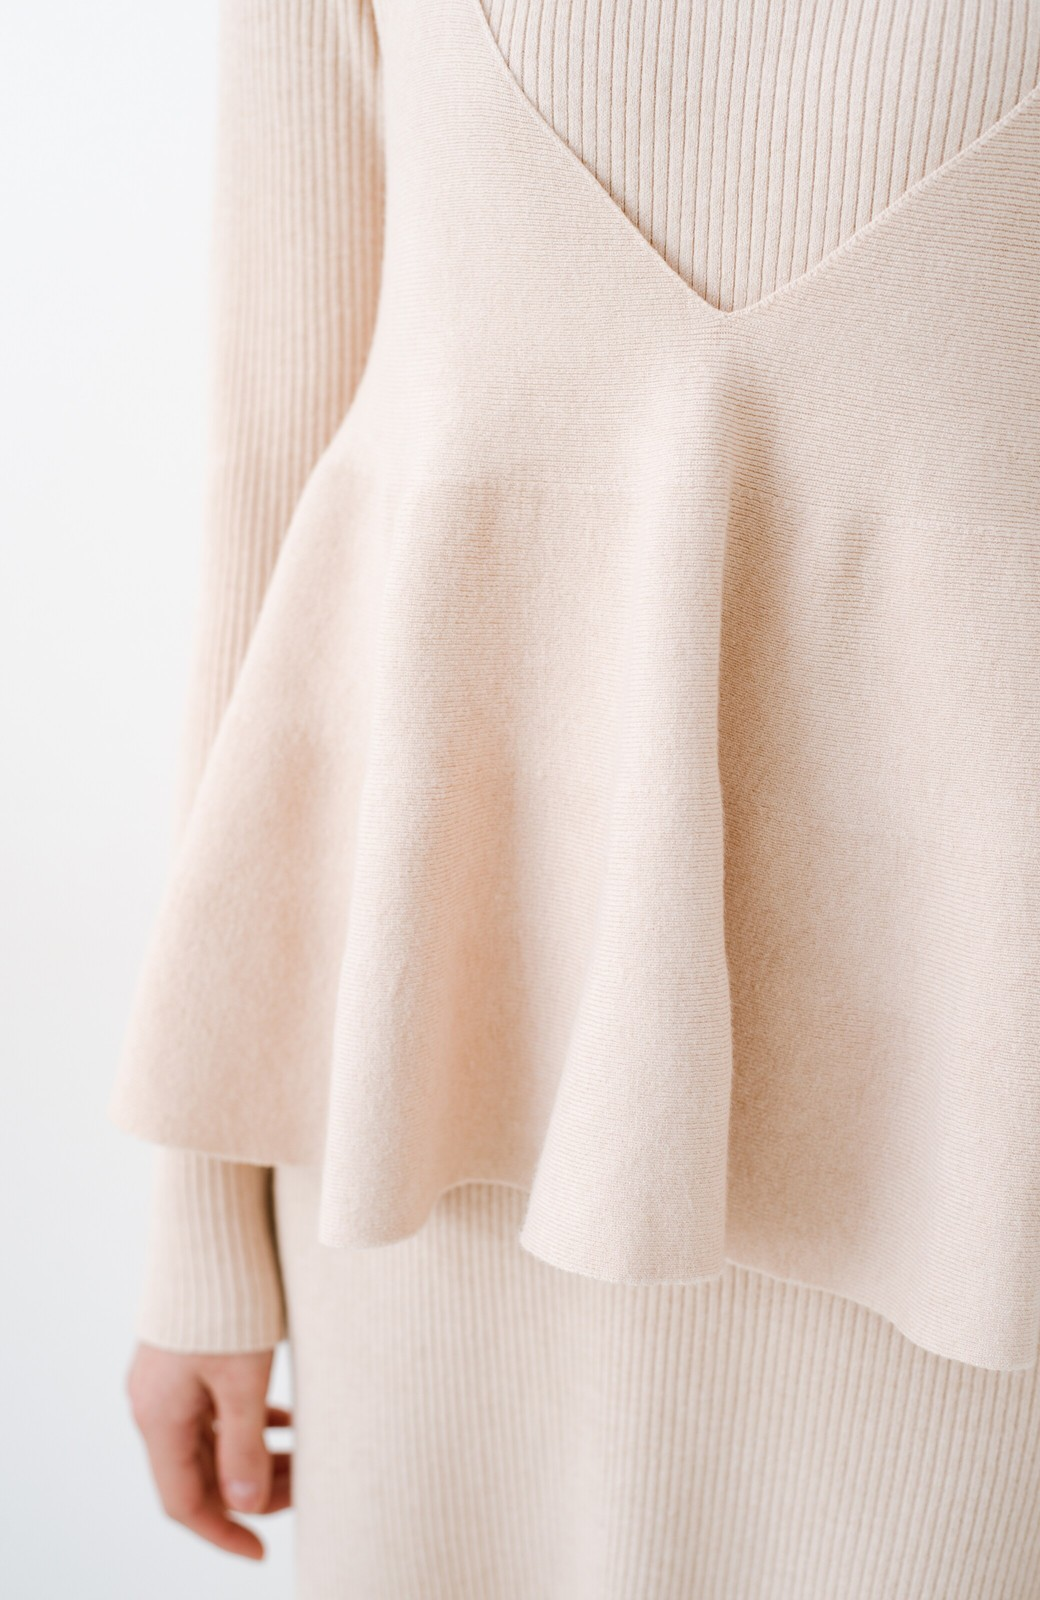 haco! ニットワンピースとキャミソールを重ねて着るだけでパッとオシャレに見えるうれしいセット by style zampa <ライトベージュ>の商品写真4